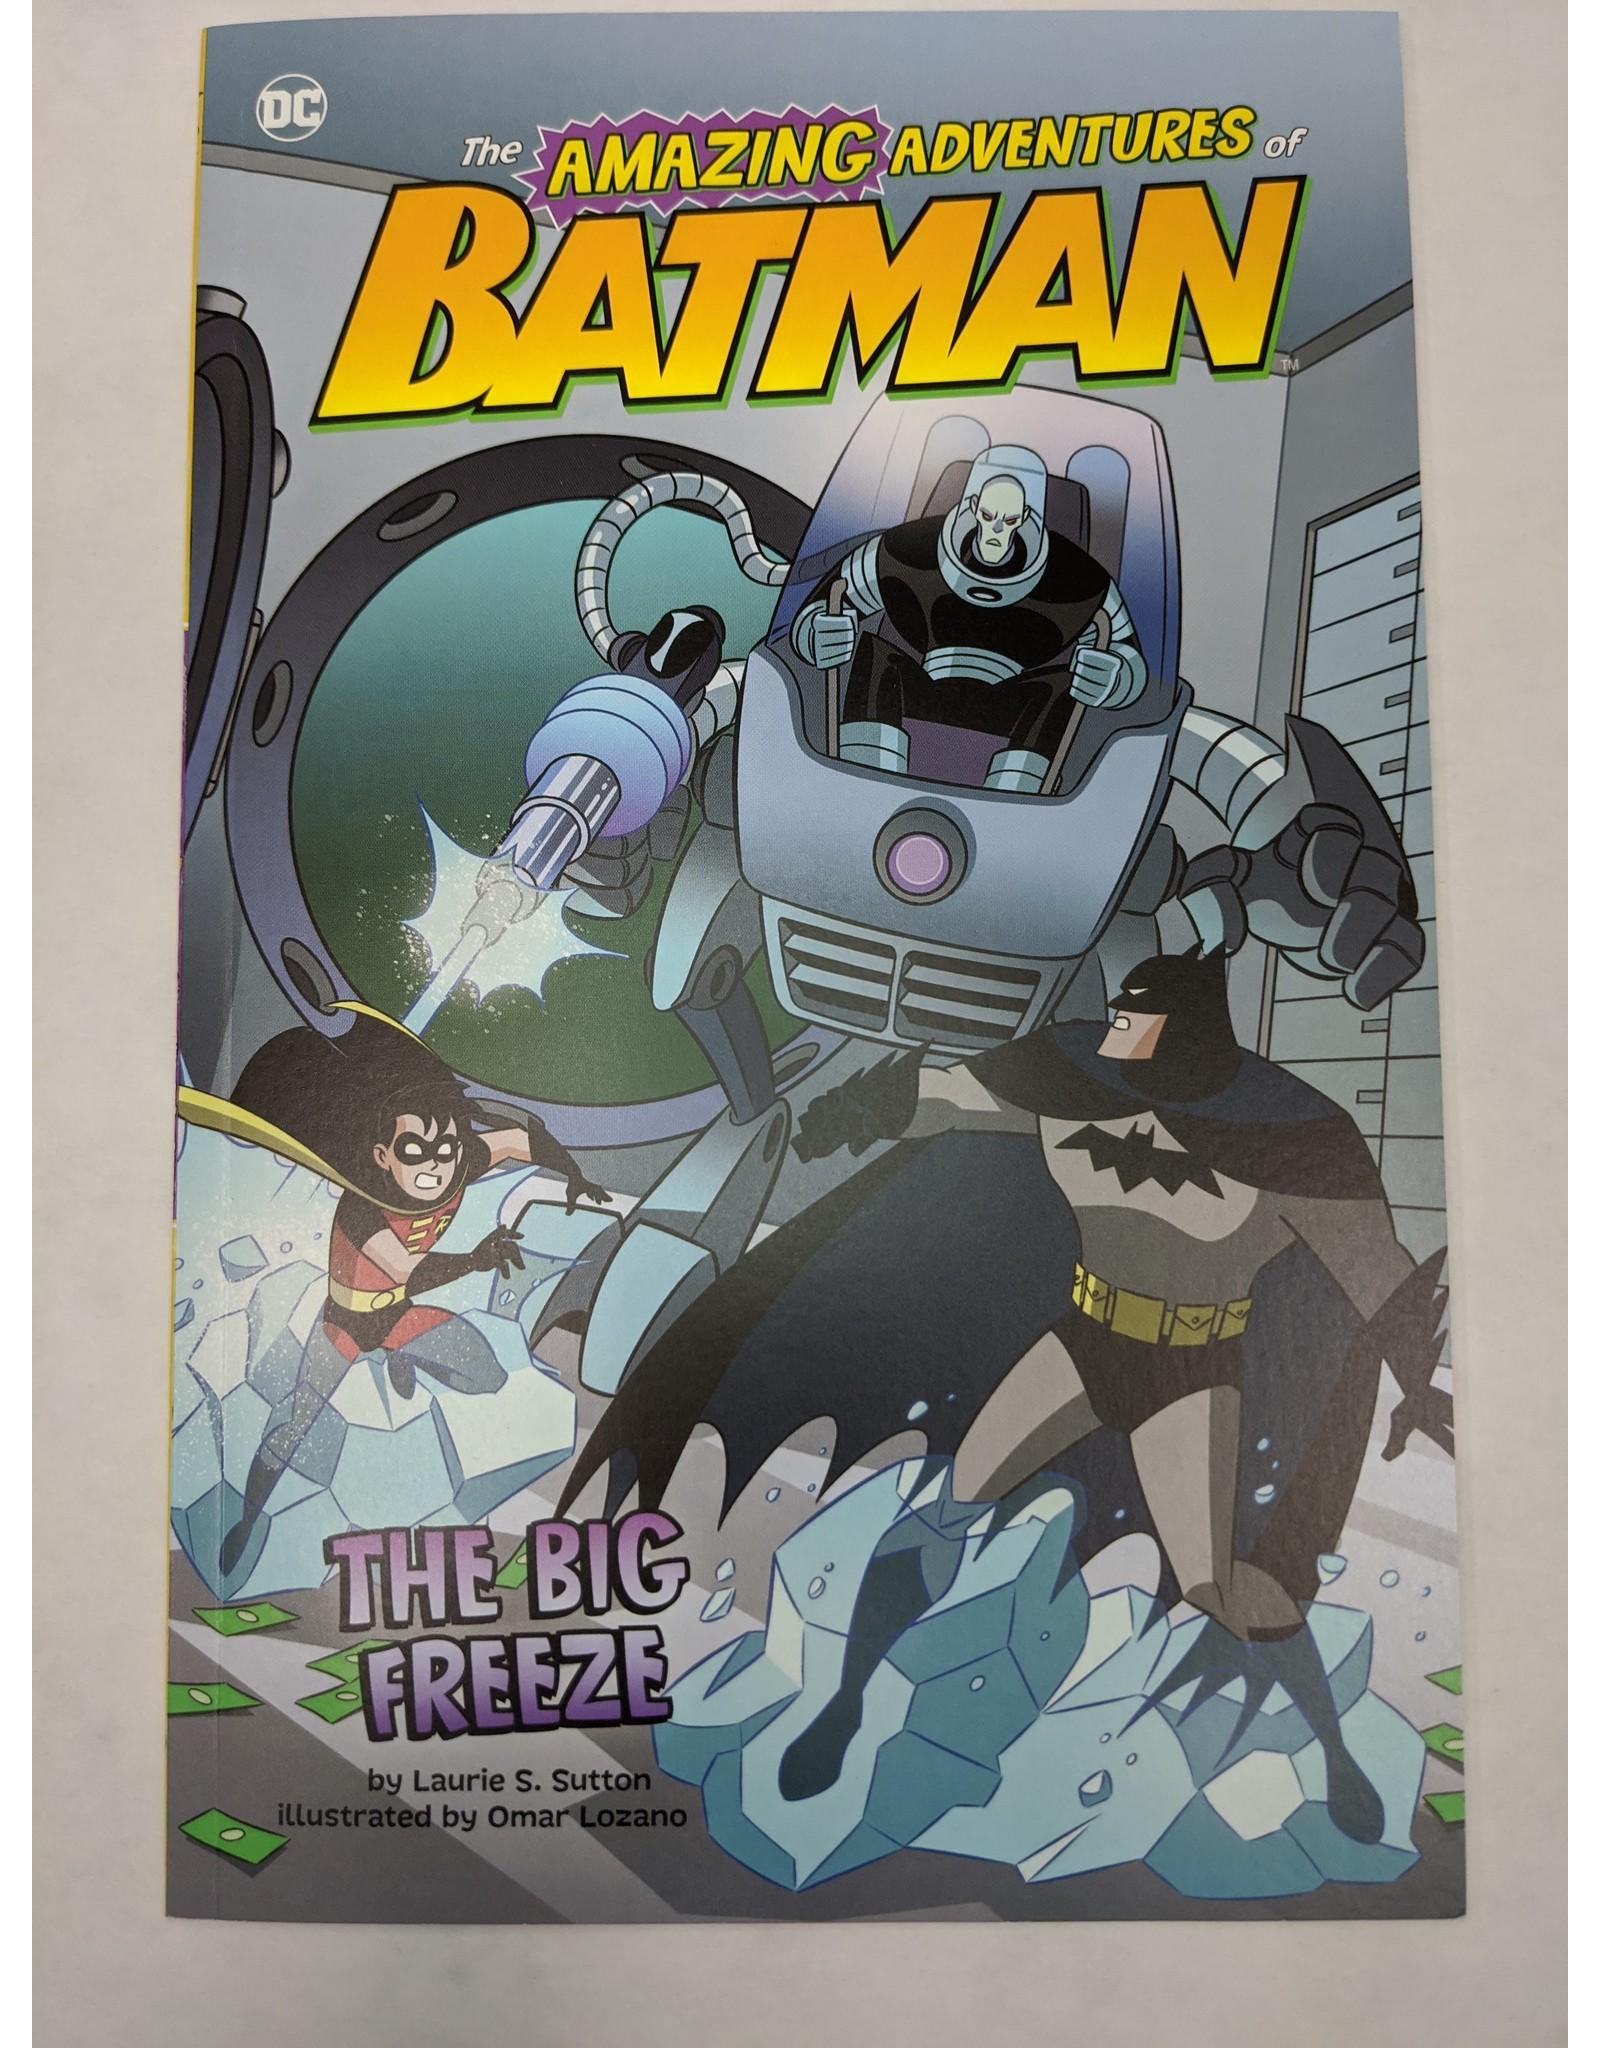 STONE ARCH BOOKS DC AMAZING ADV OF BATMAN YR SC BIG FREEZE